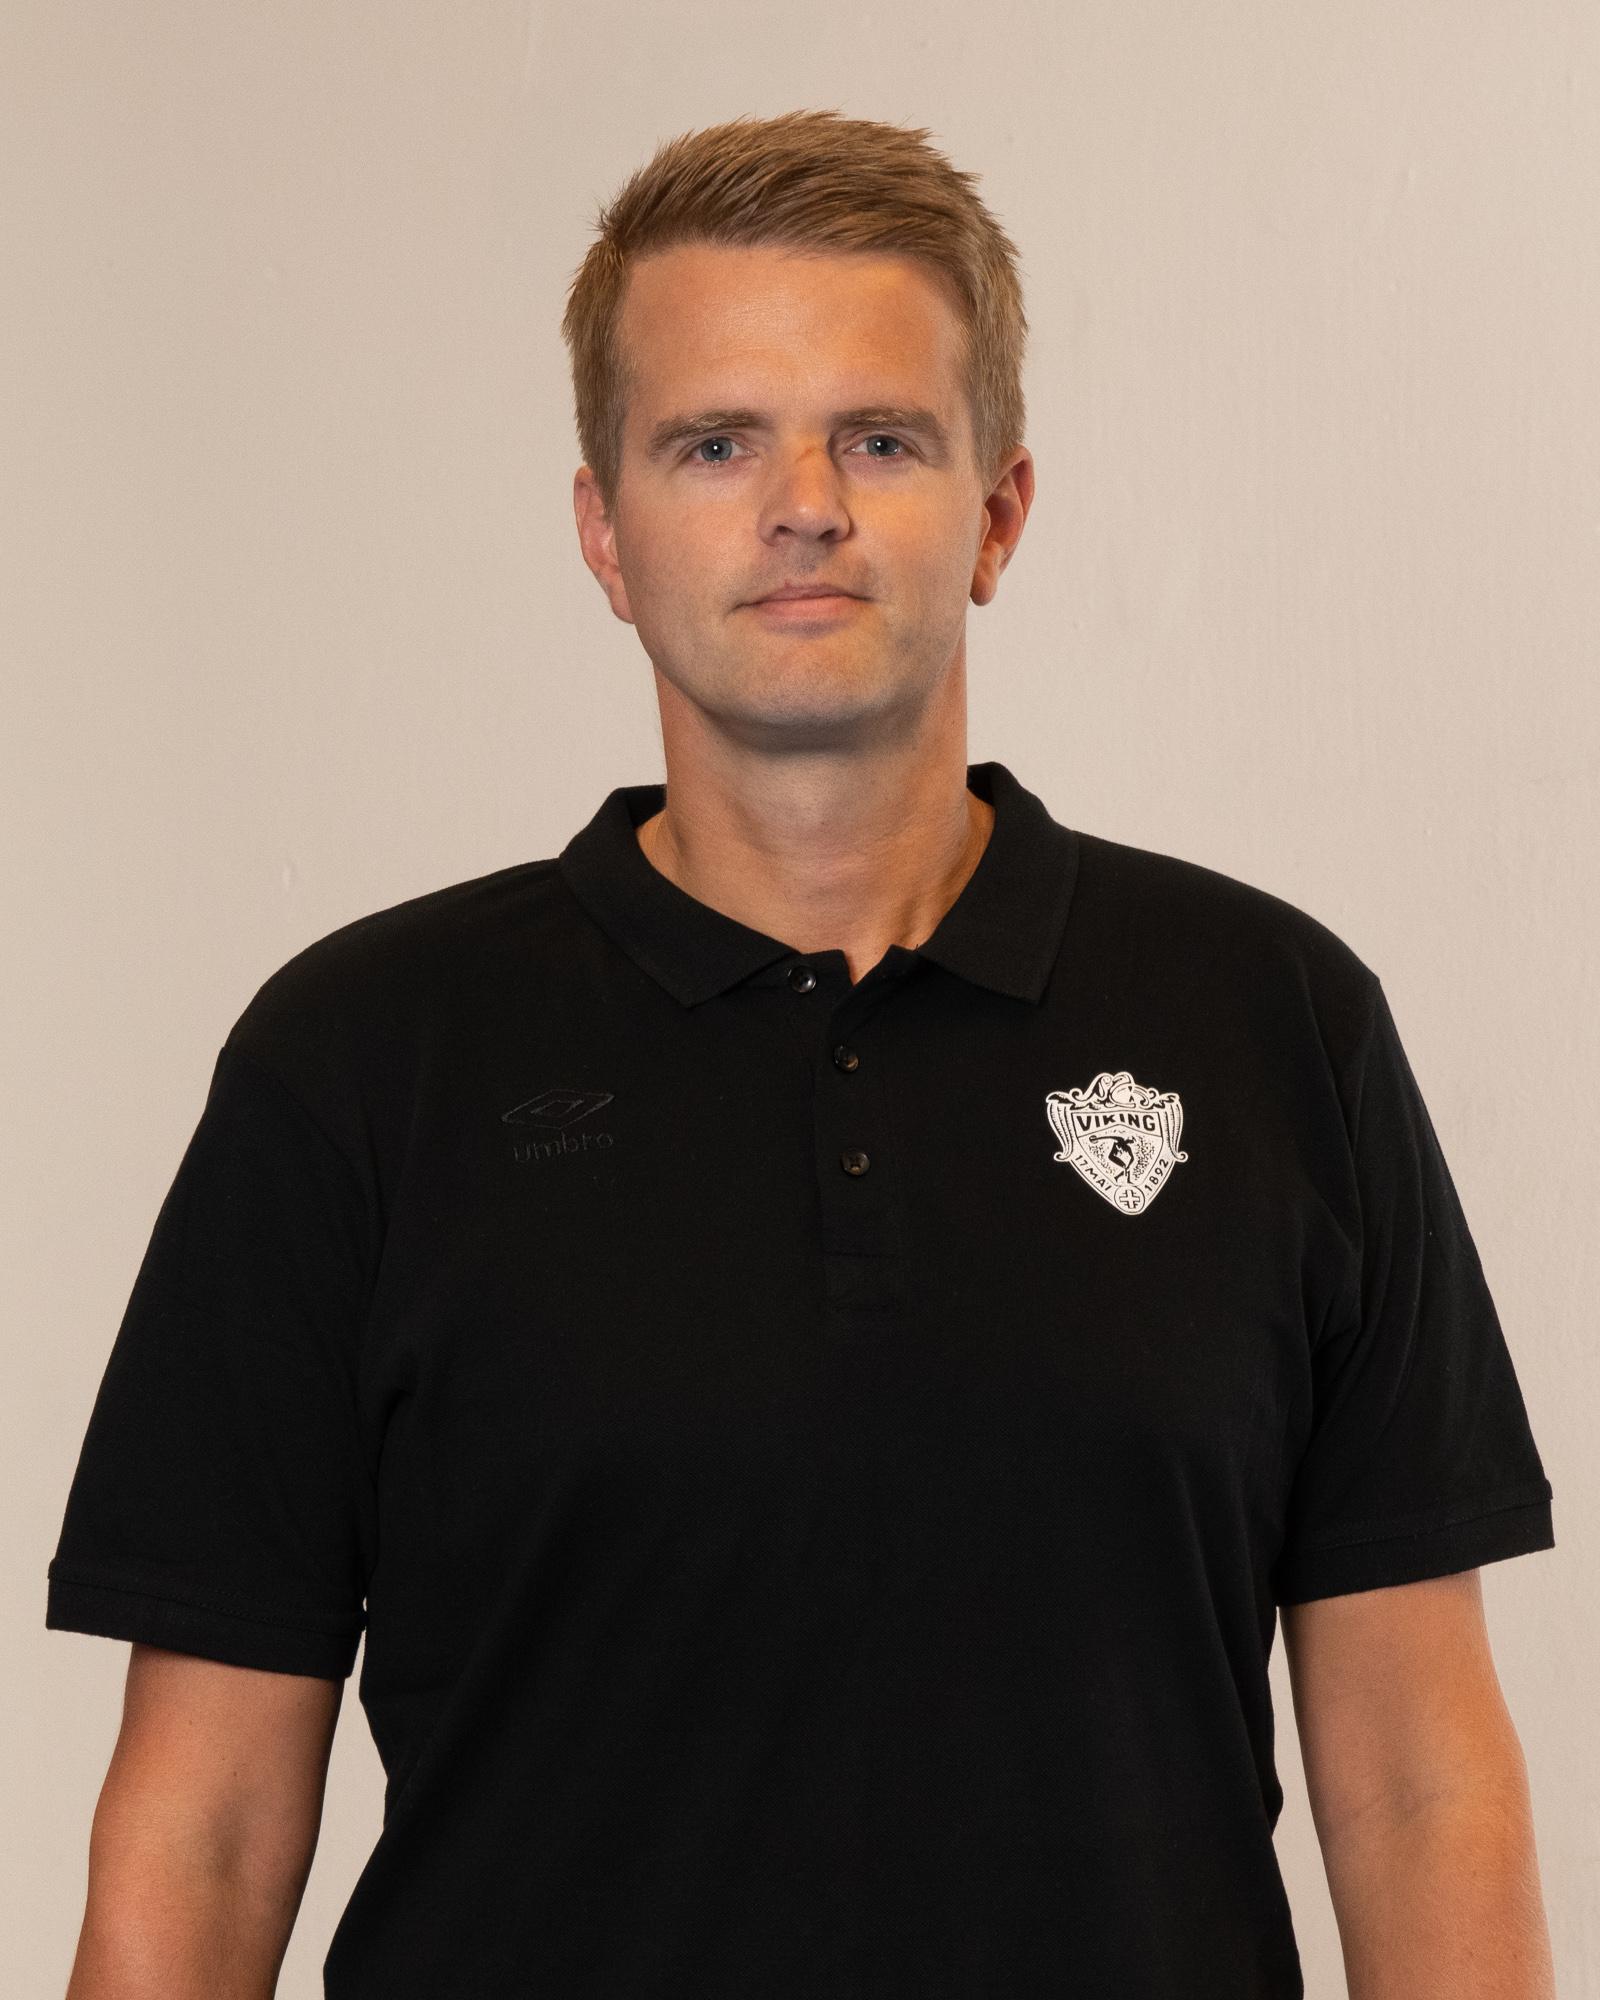 Andreas Berntsen